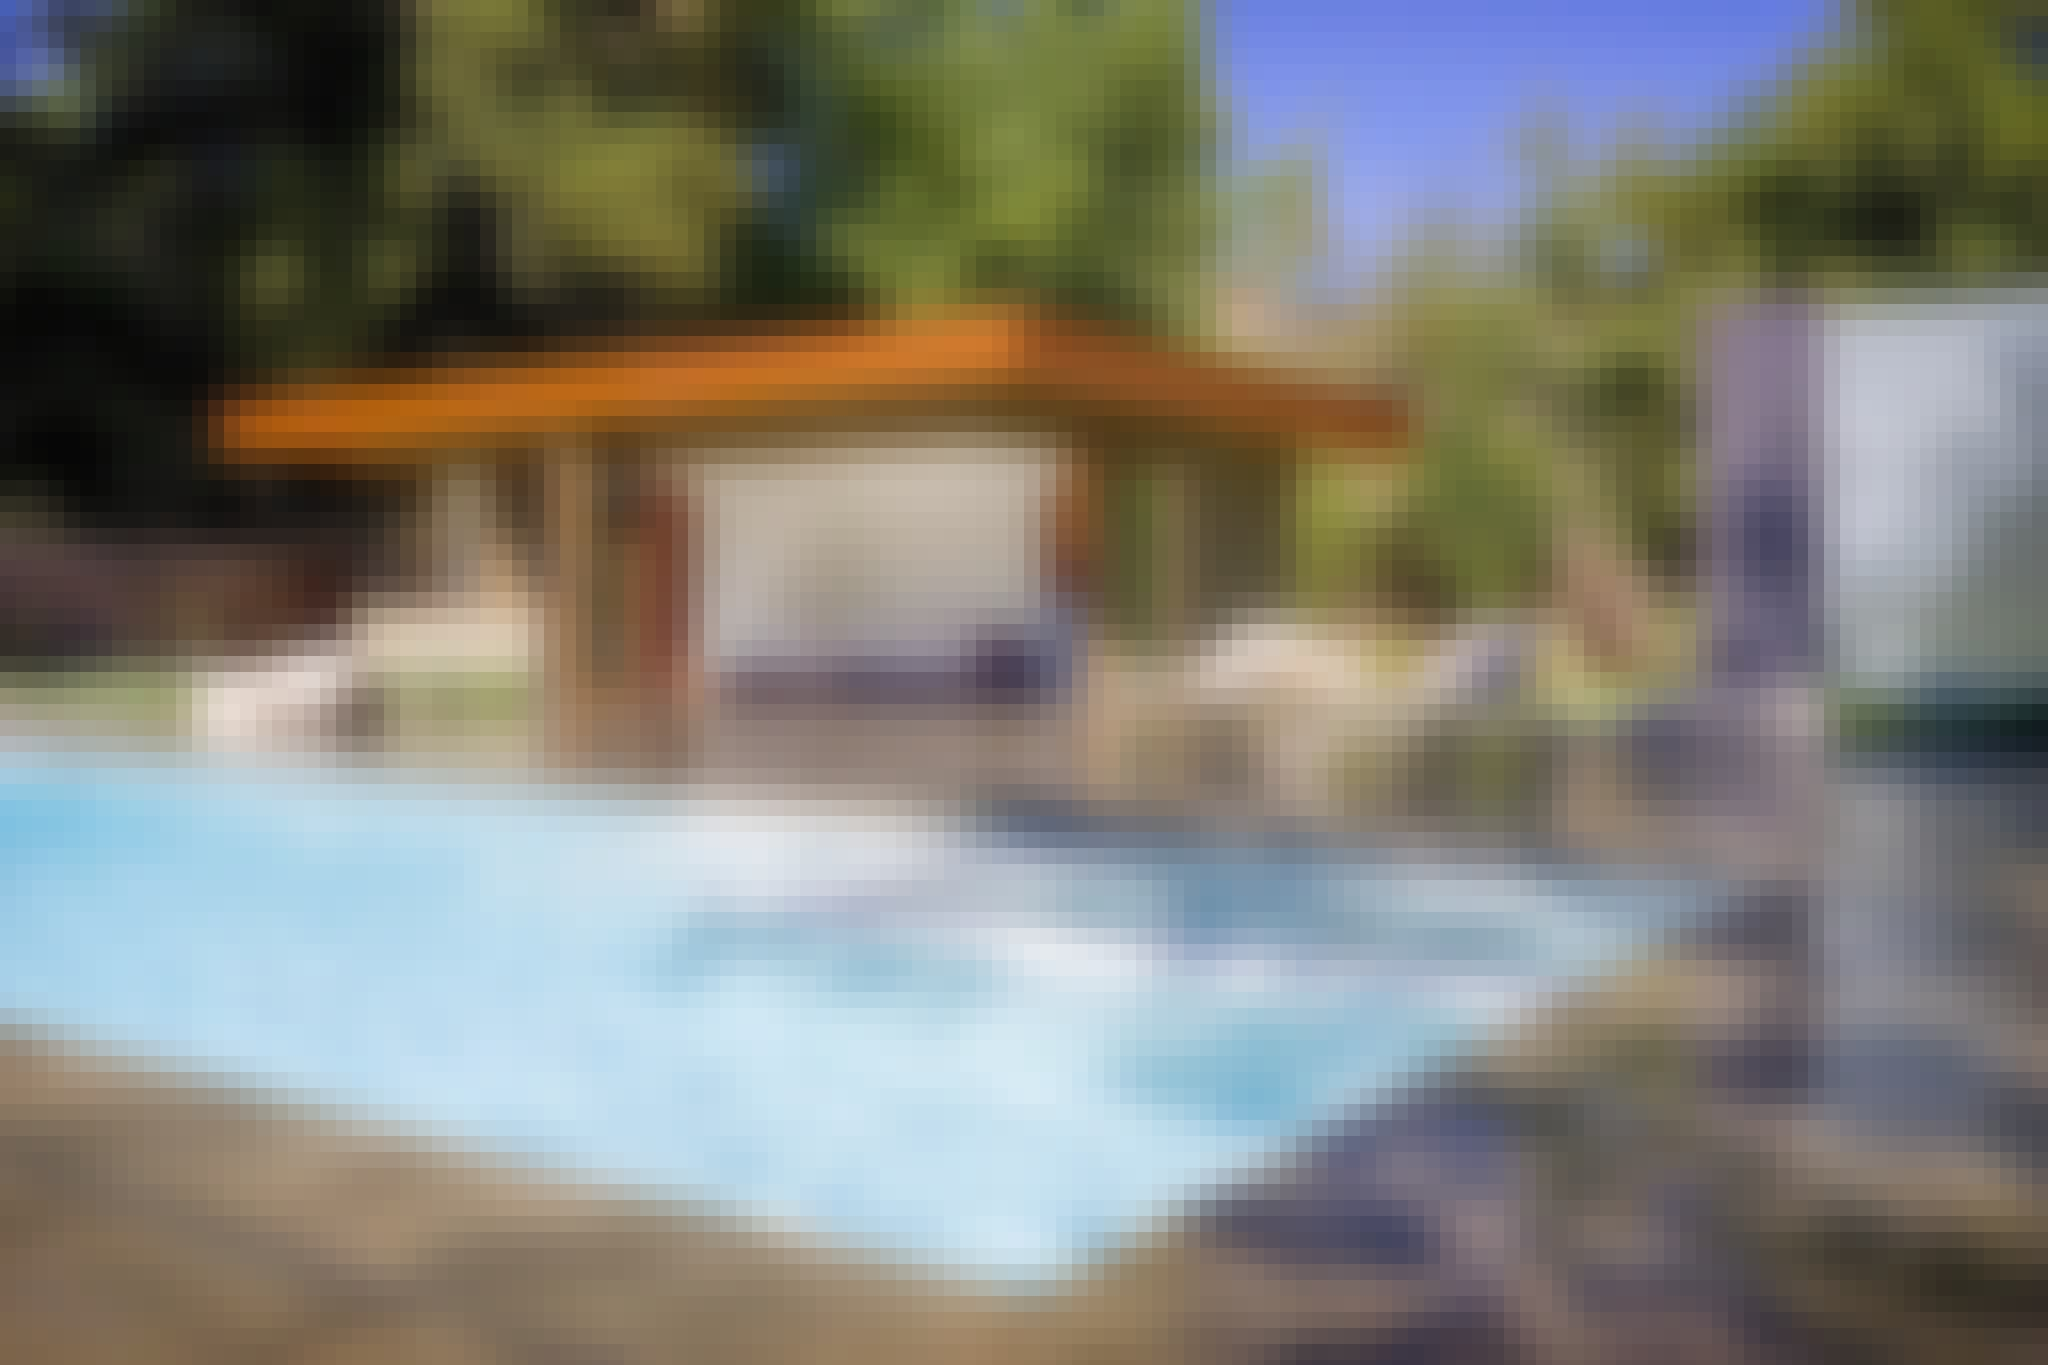 pool house with accordion glass doors